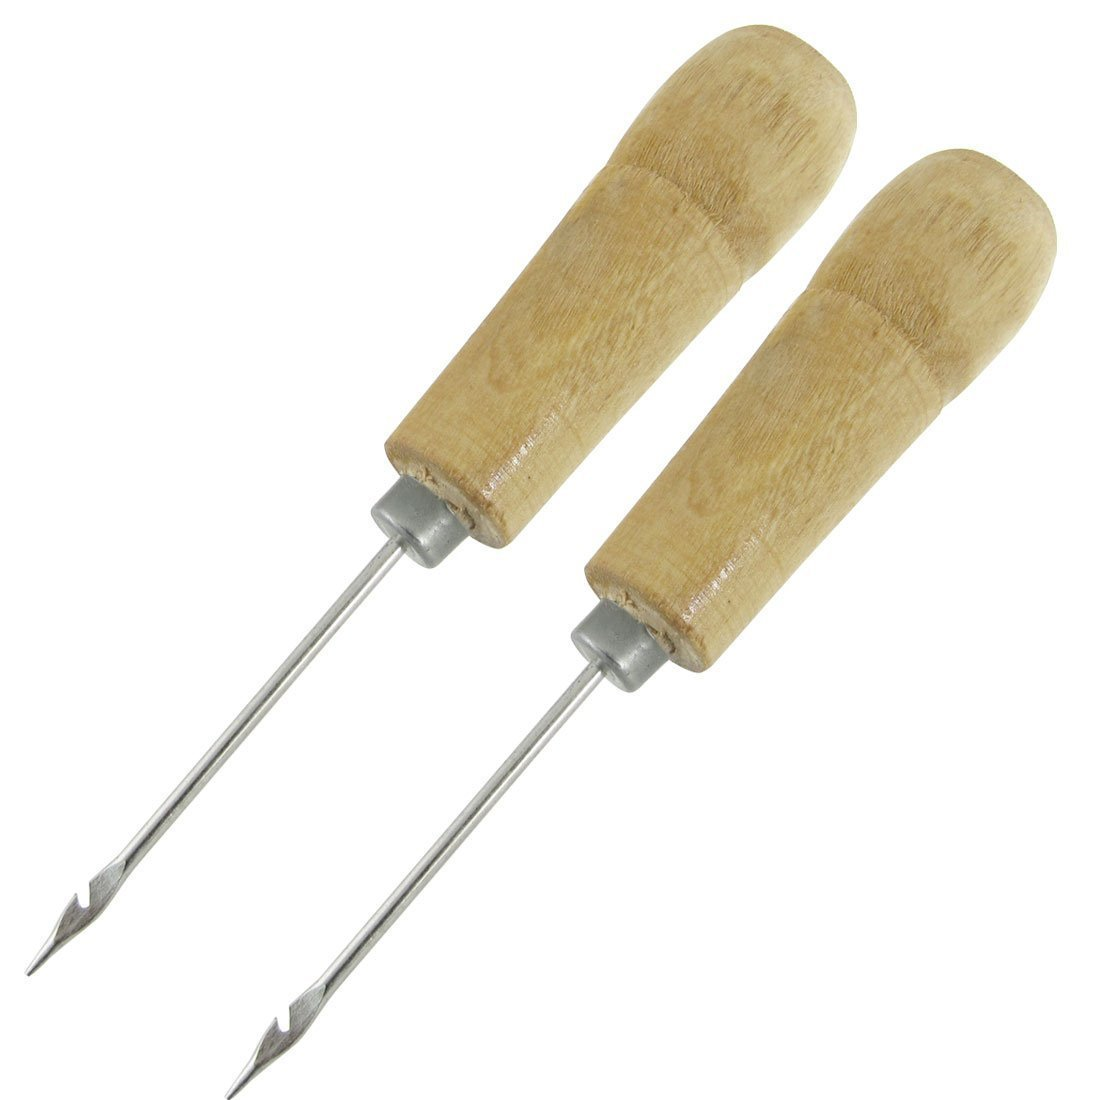 SODIAL(R) 2 Pcs Wooden Handle Sewing Awl Speedy Hand Stitcher LEPAZIK1783